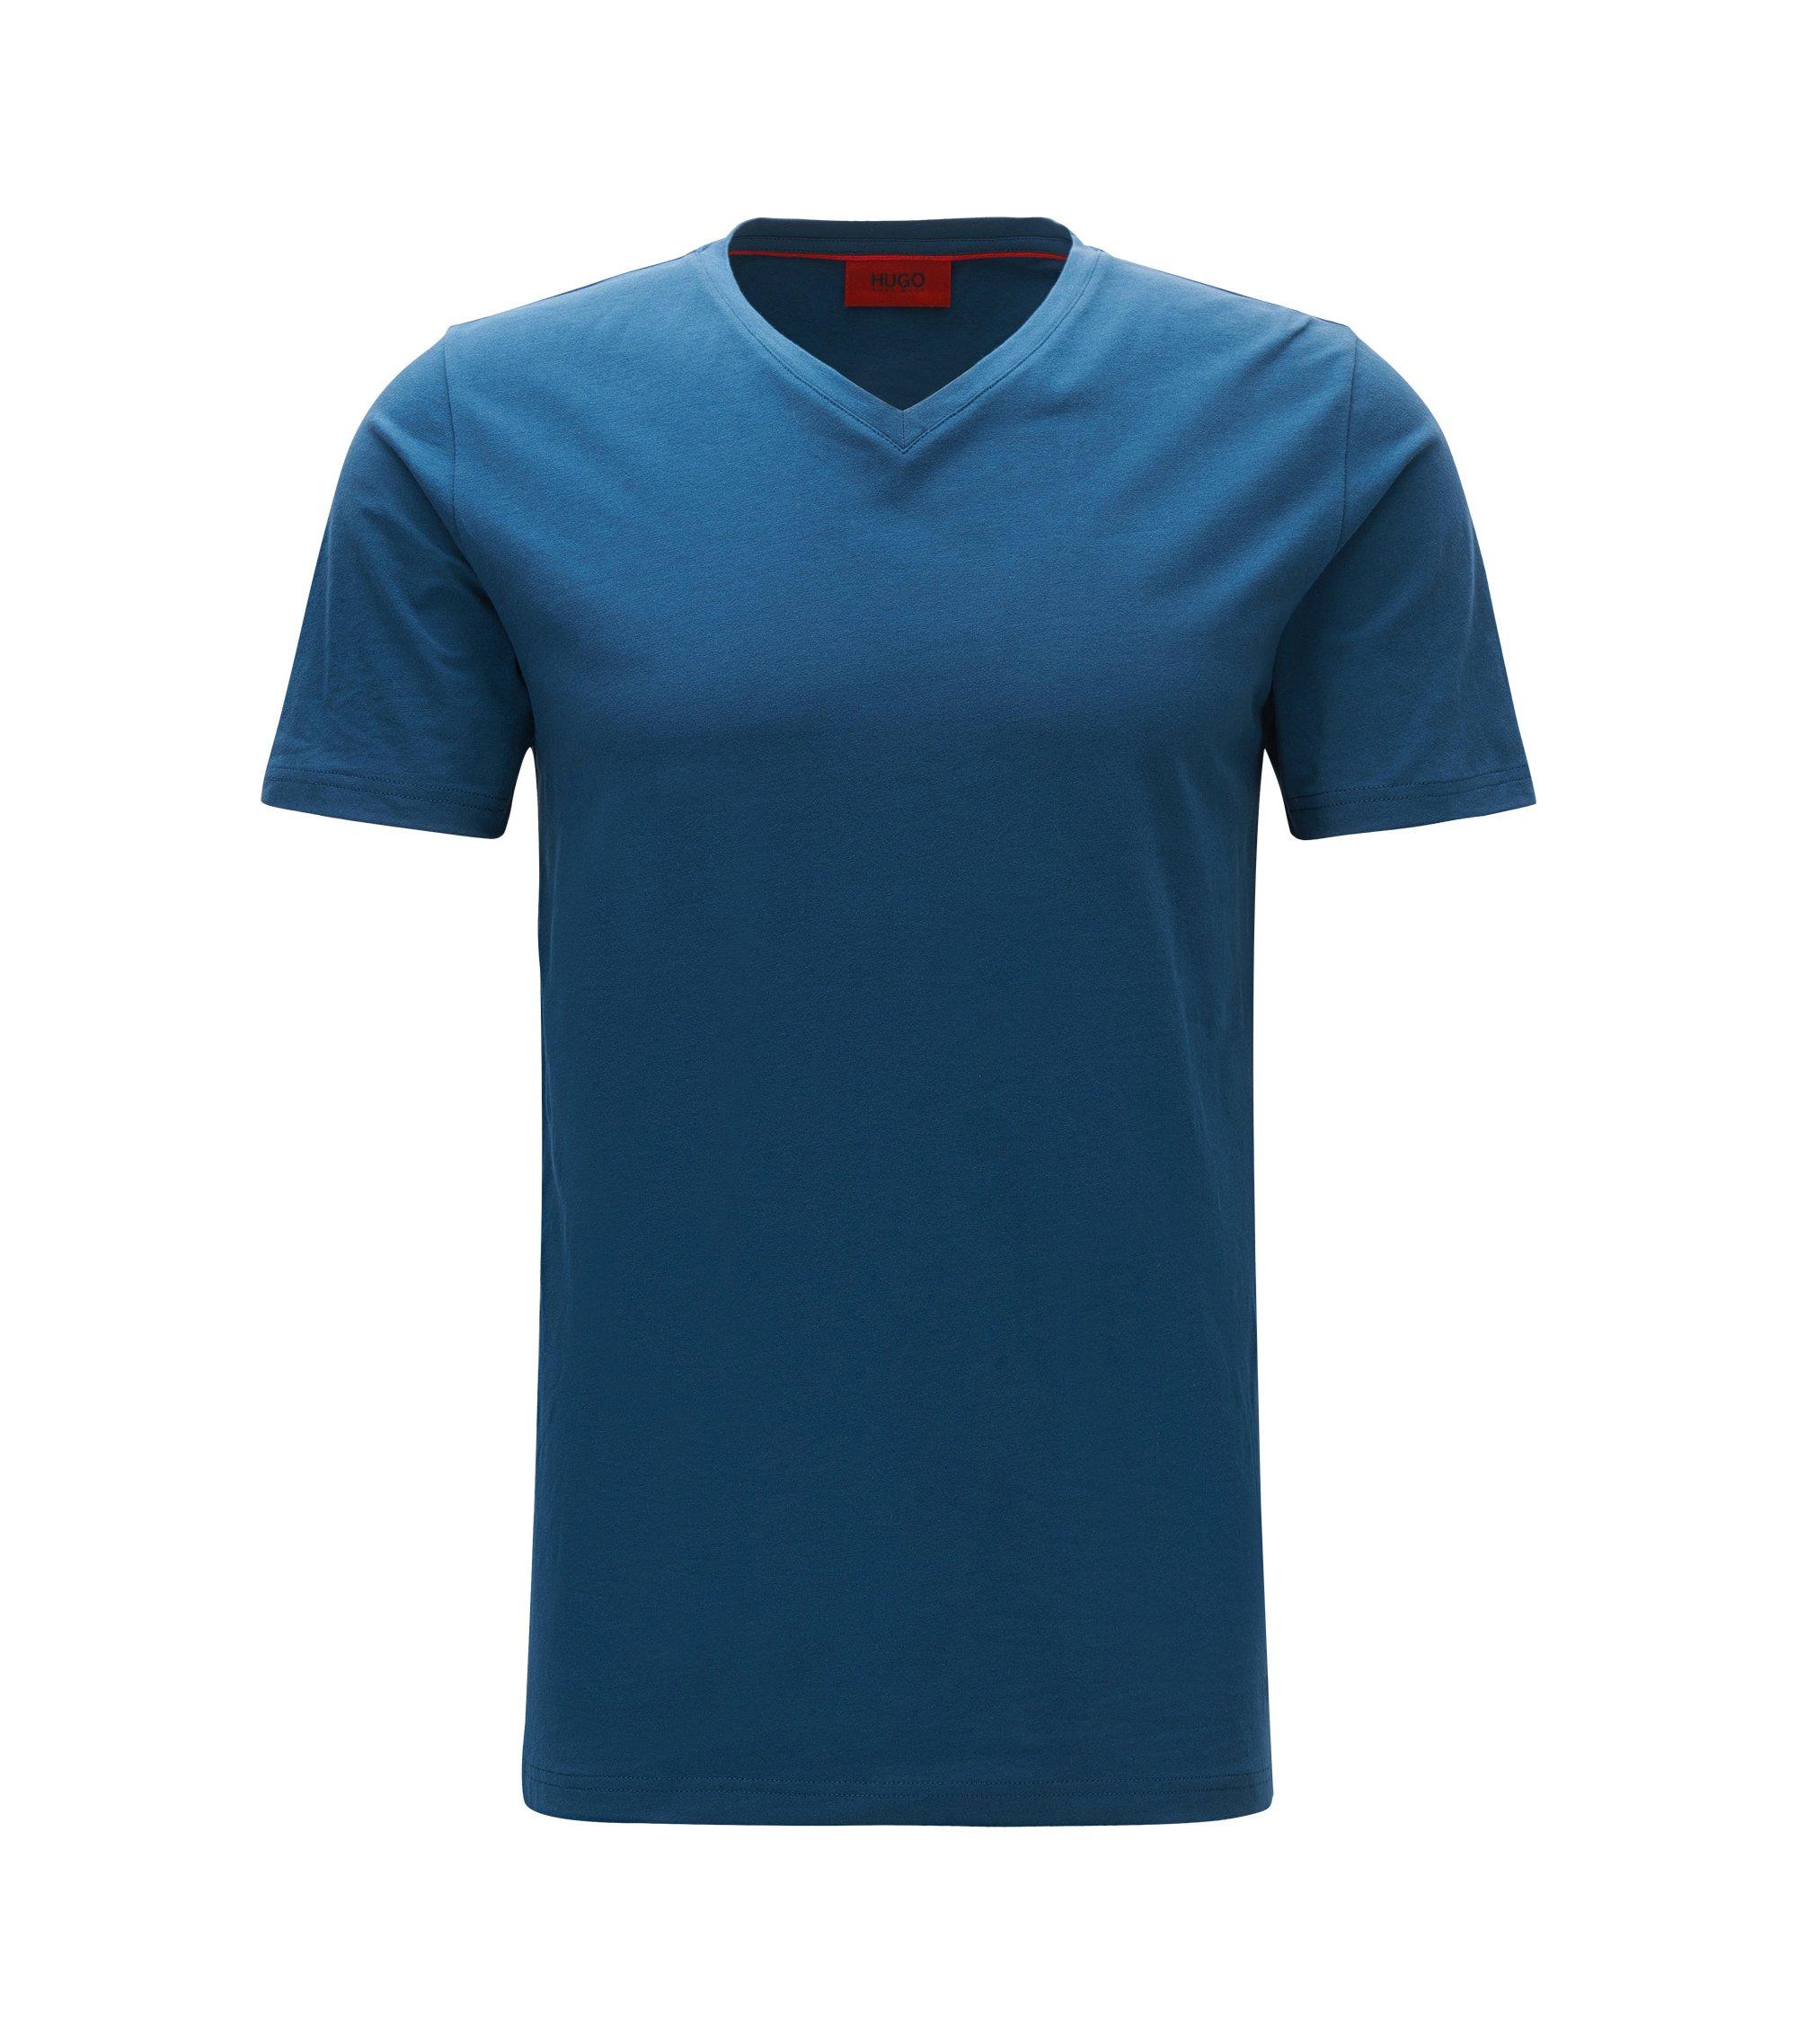 V-neck T-shirt in stretch cotton jersey, Dark Blue